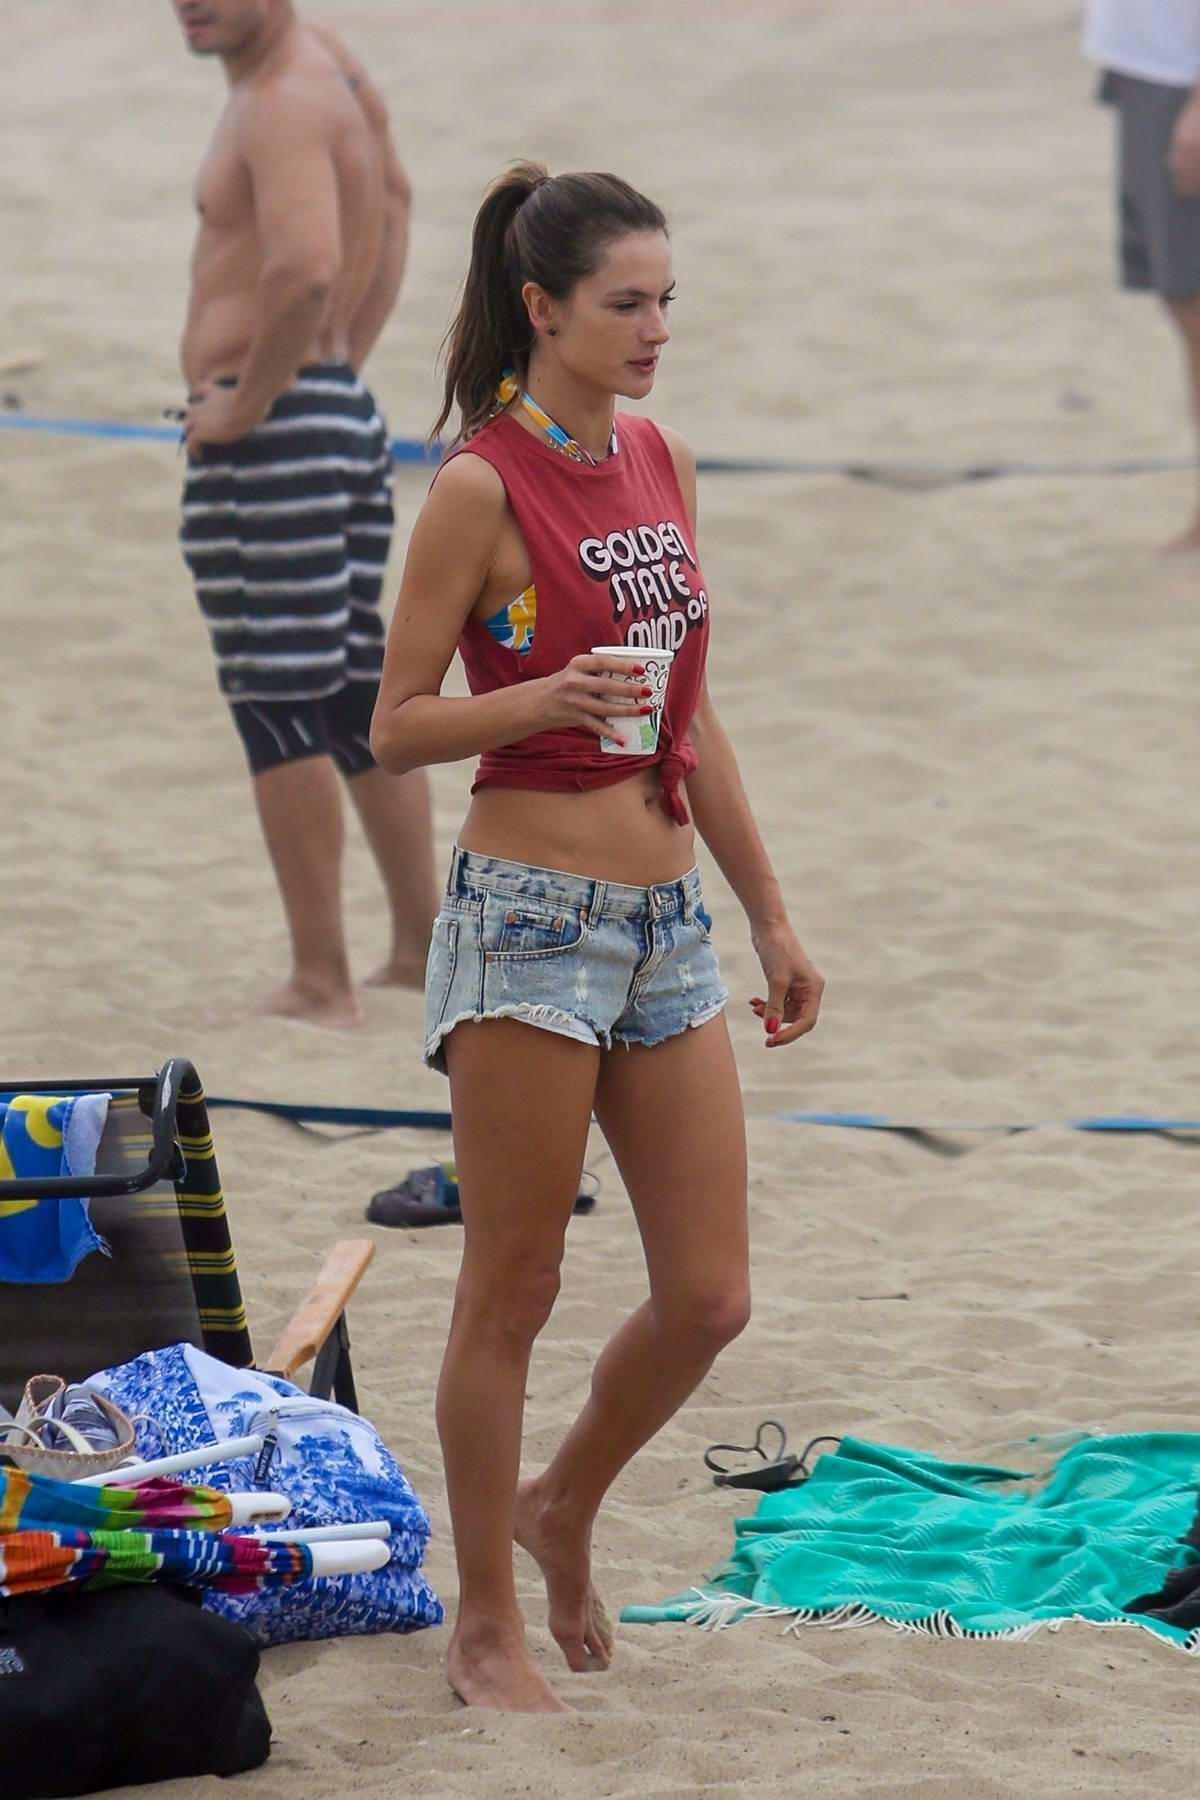 Alessandra Ambrosio plays volleyball on the beach in Santa Monica, California